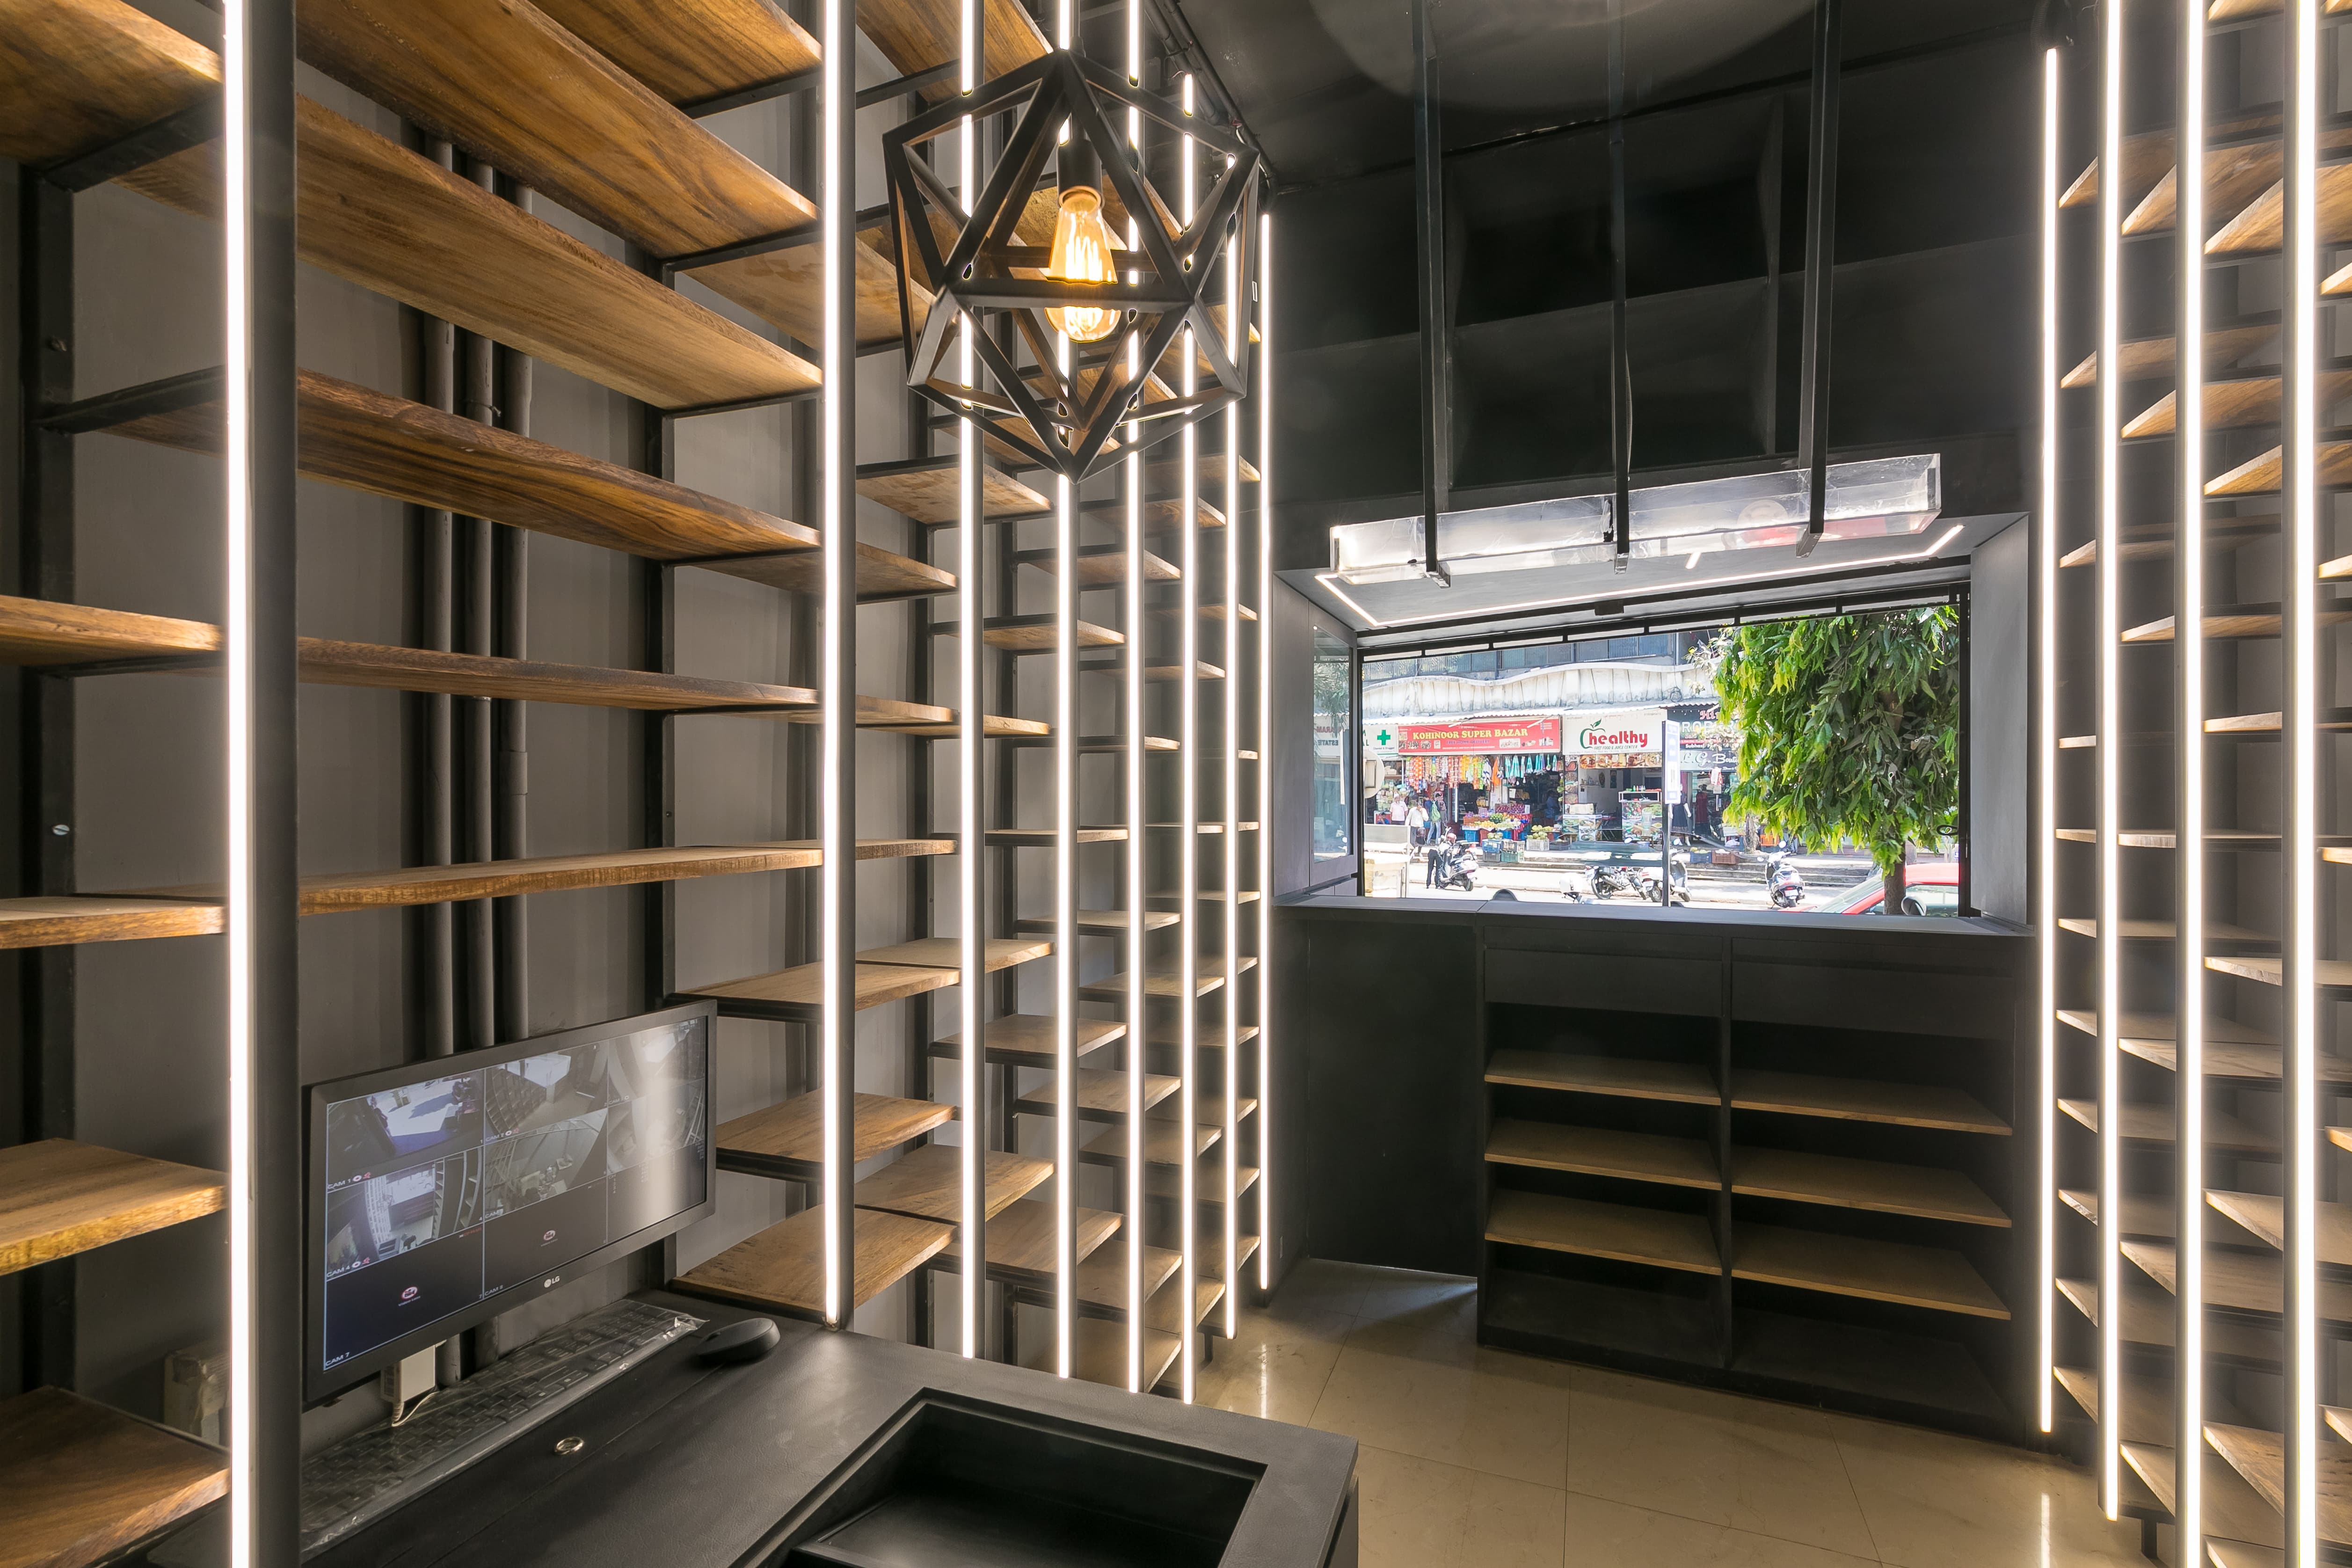 Liquor store Kayz studio 3